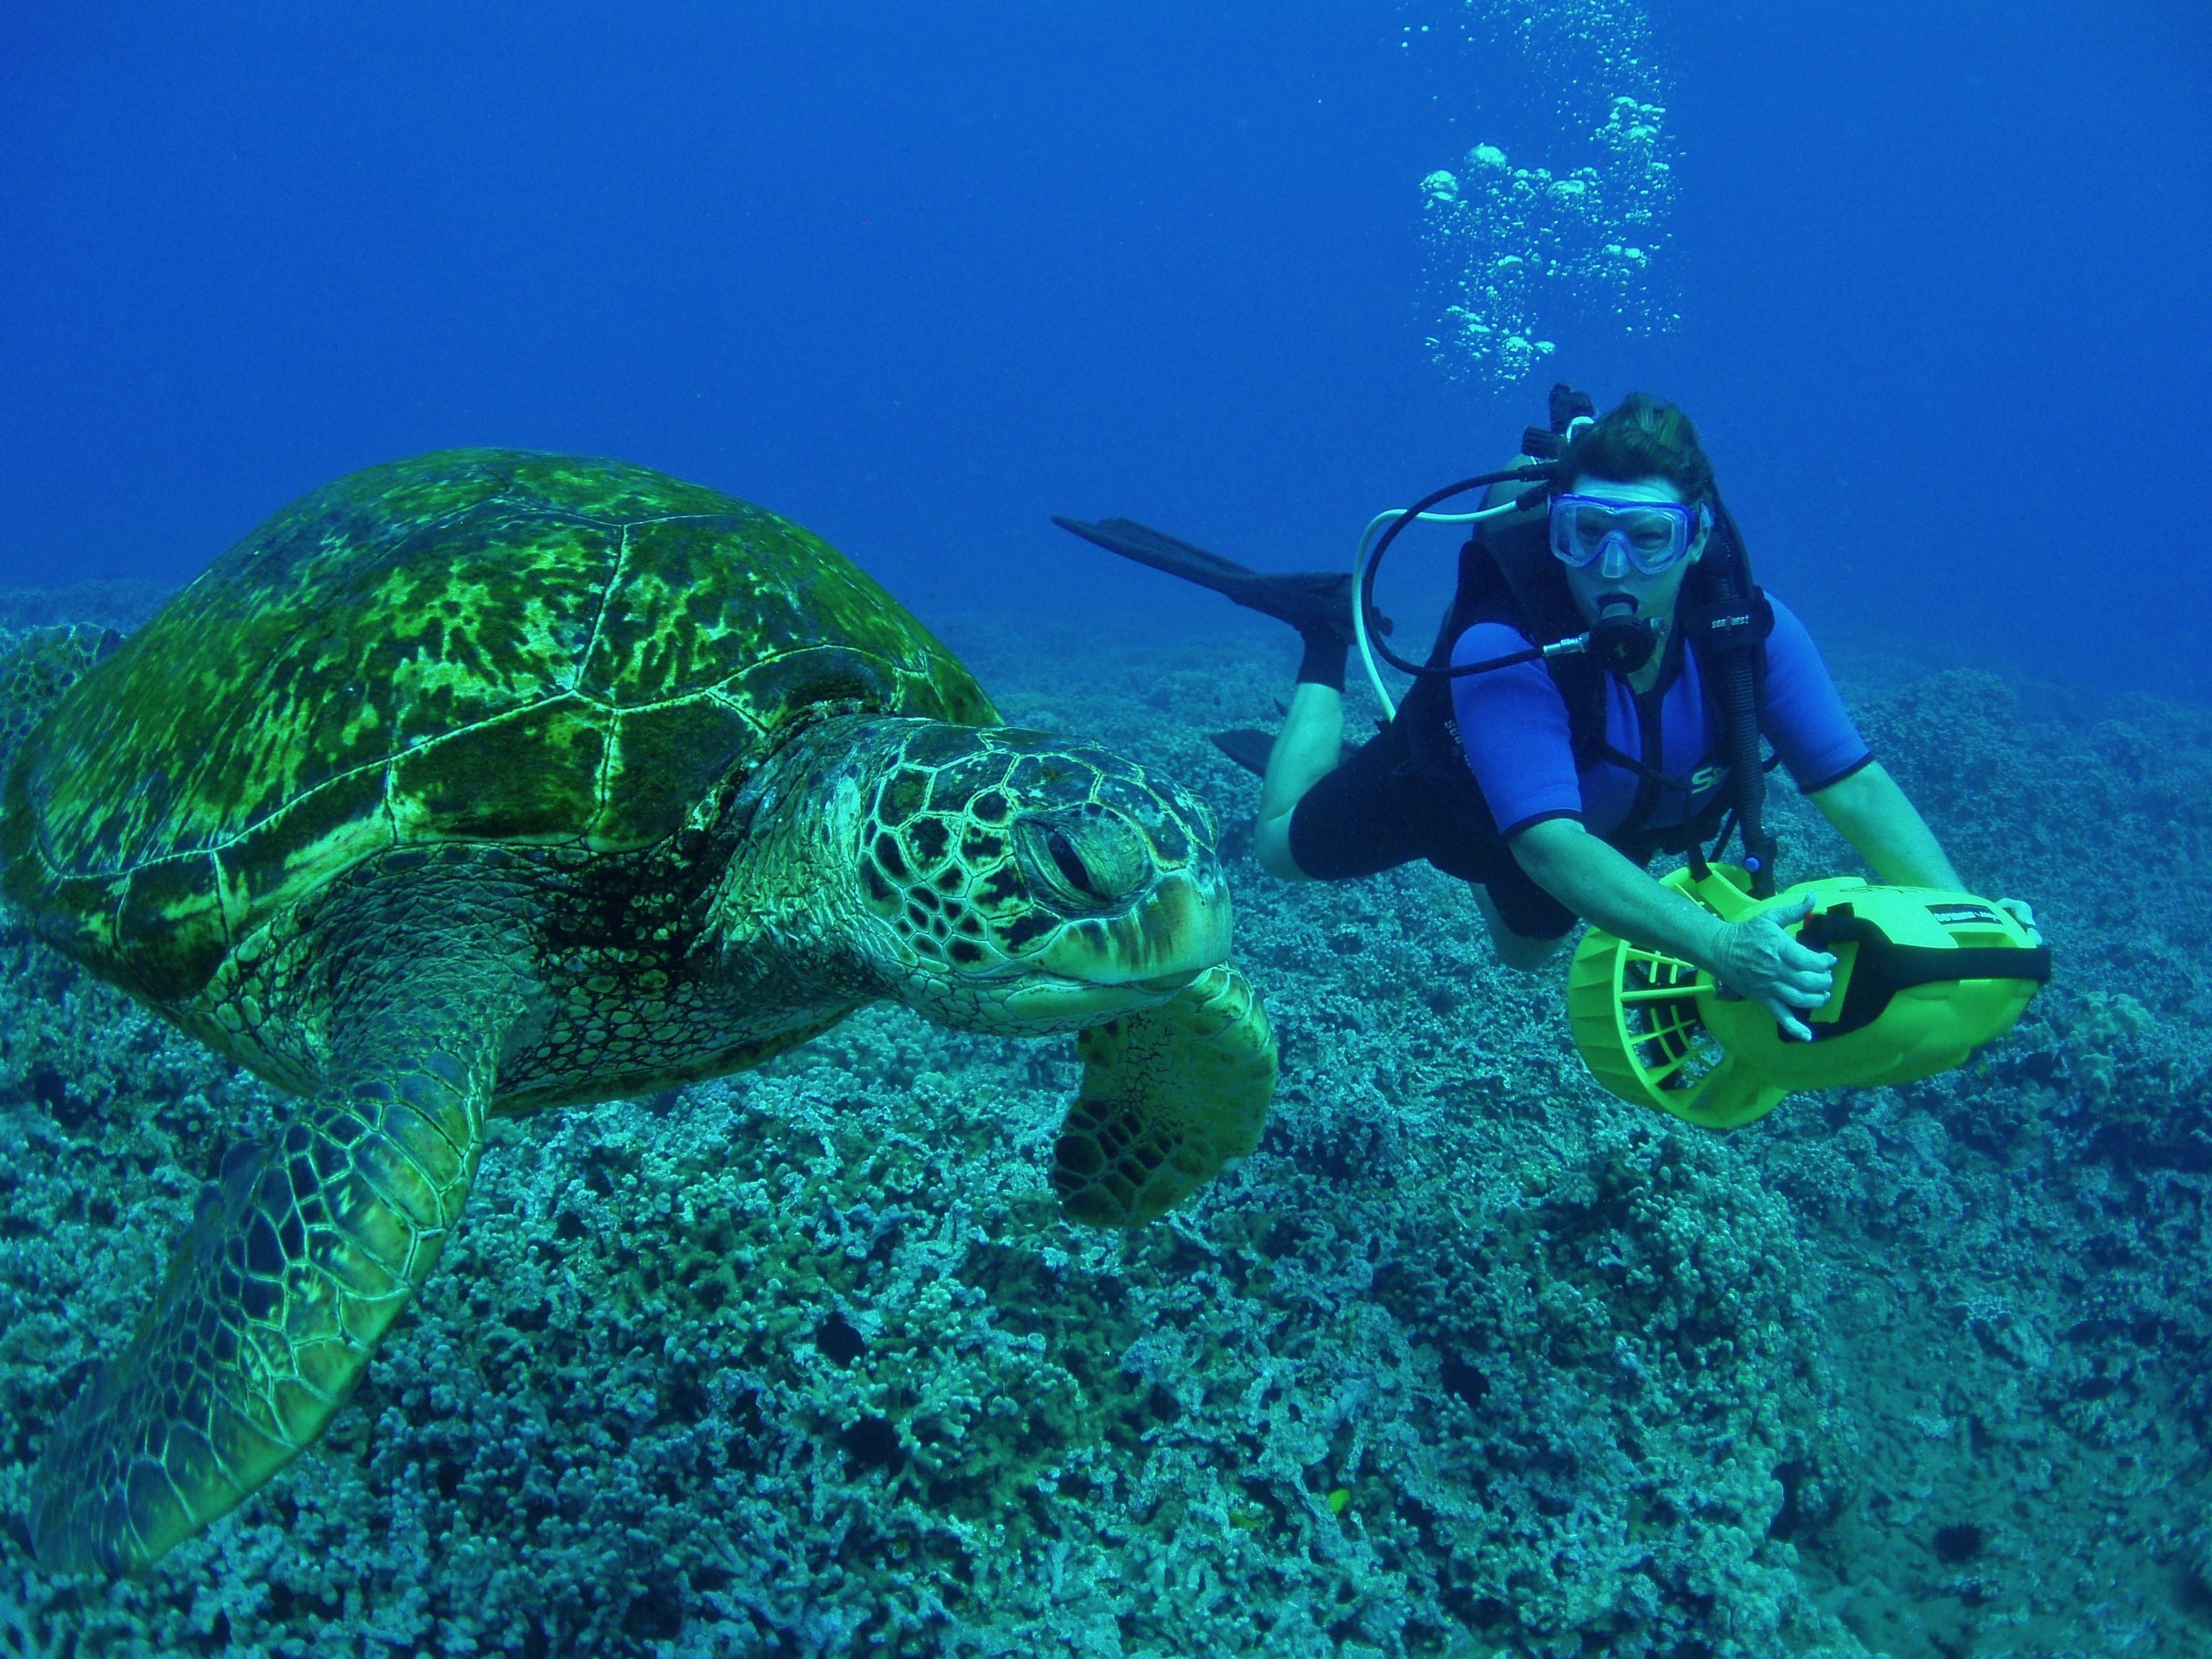 Baby Green Sea Turtles - photo#21